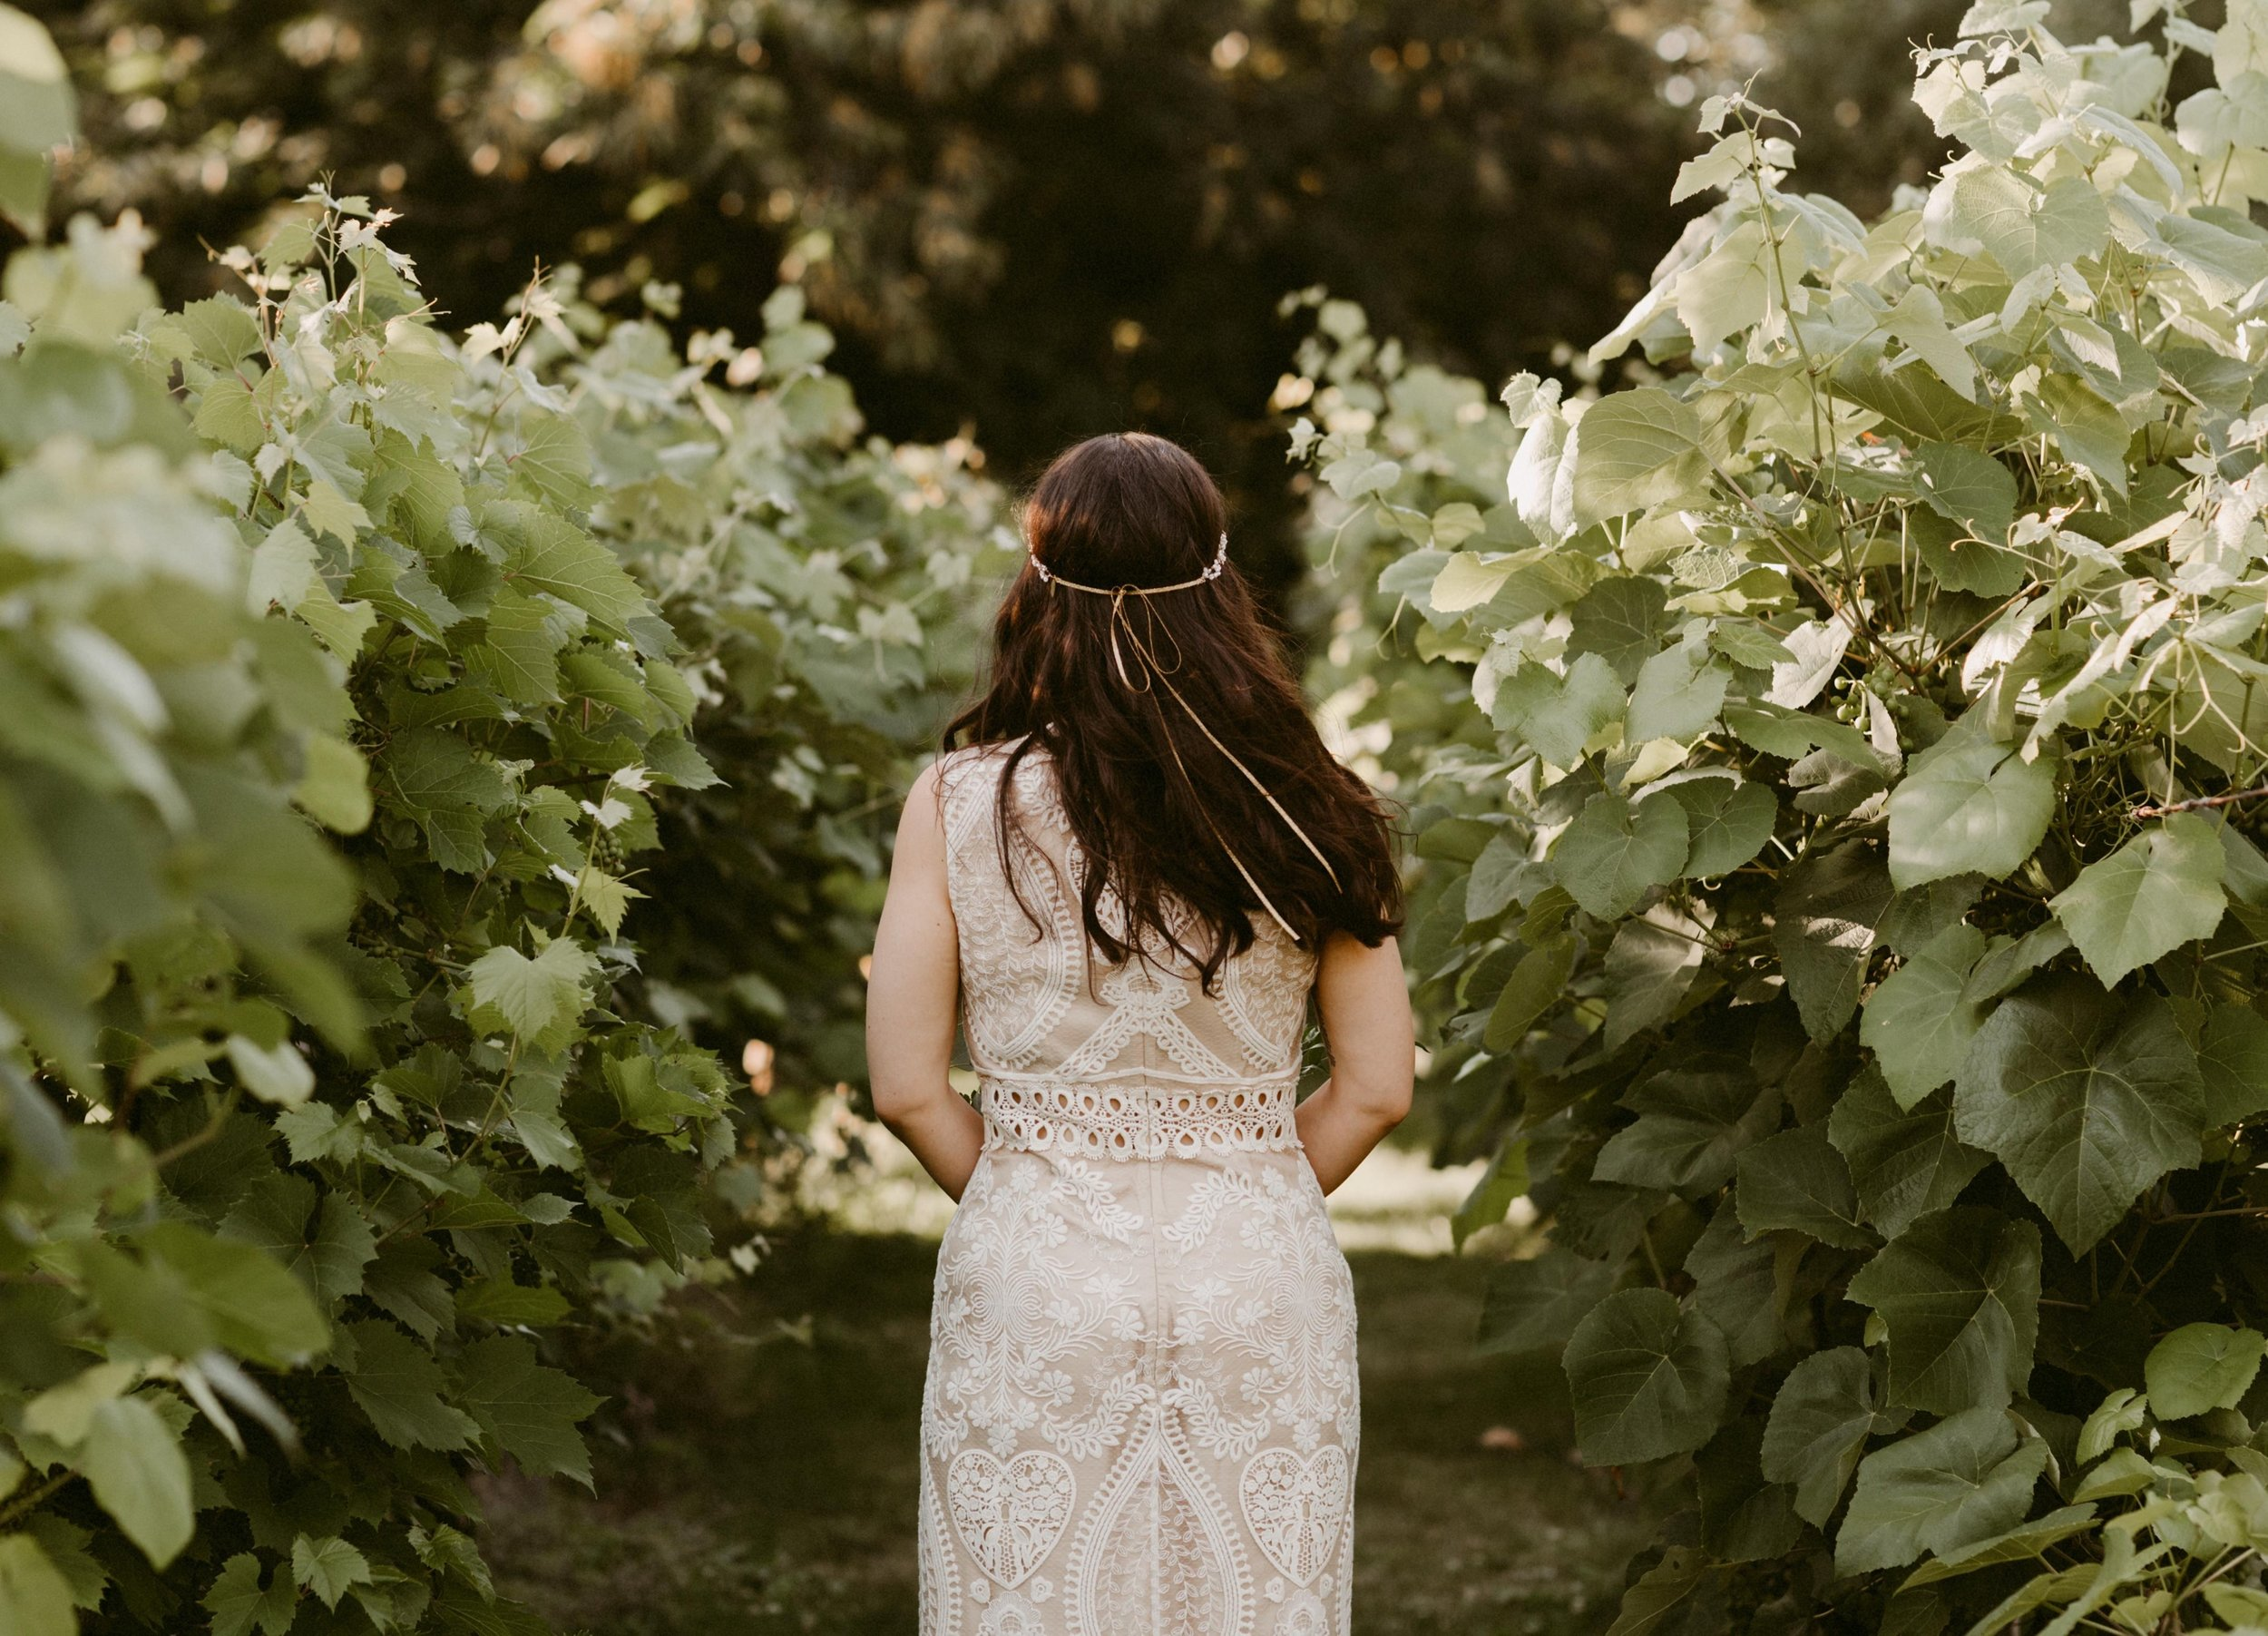 048_Spadina House Wedding (344 of 748)_House_Spadina_intimate_Toronto_Wedding.jpg